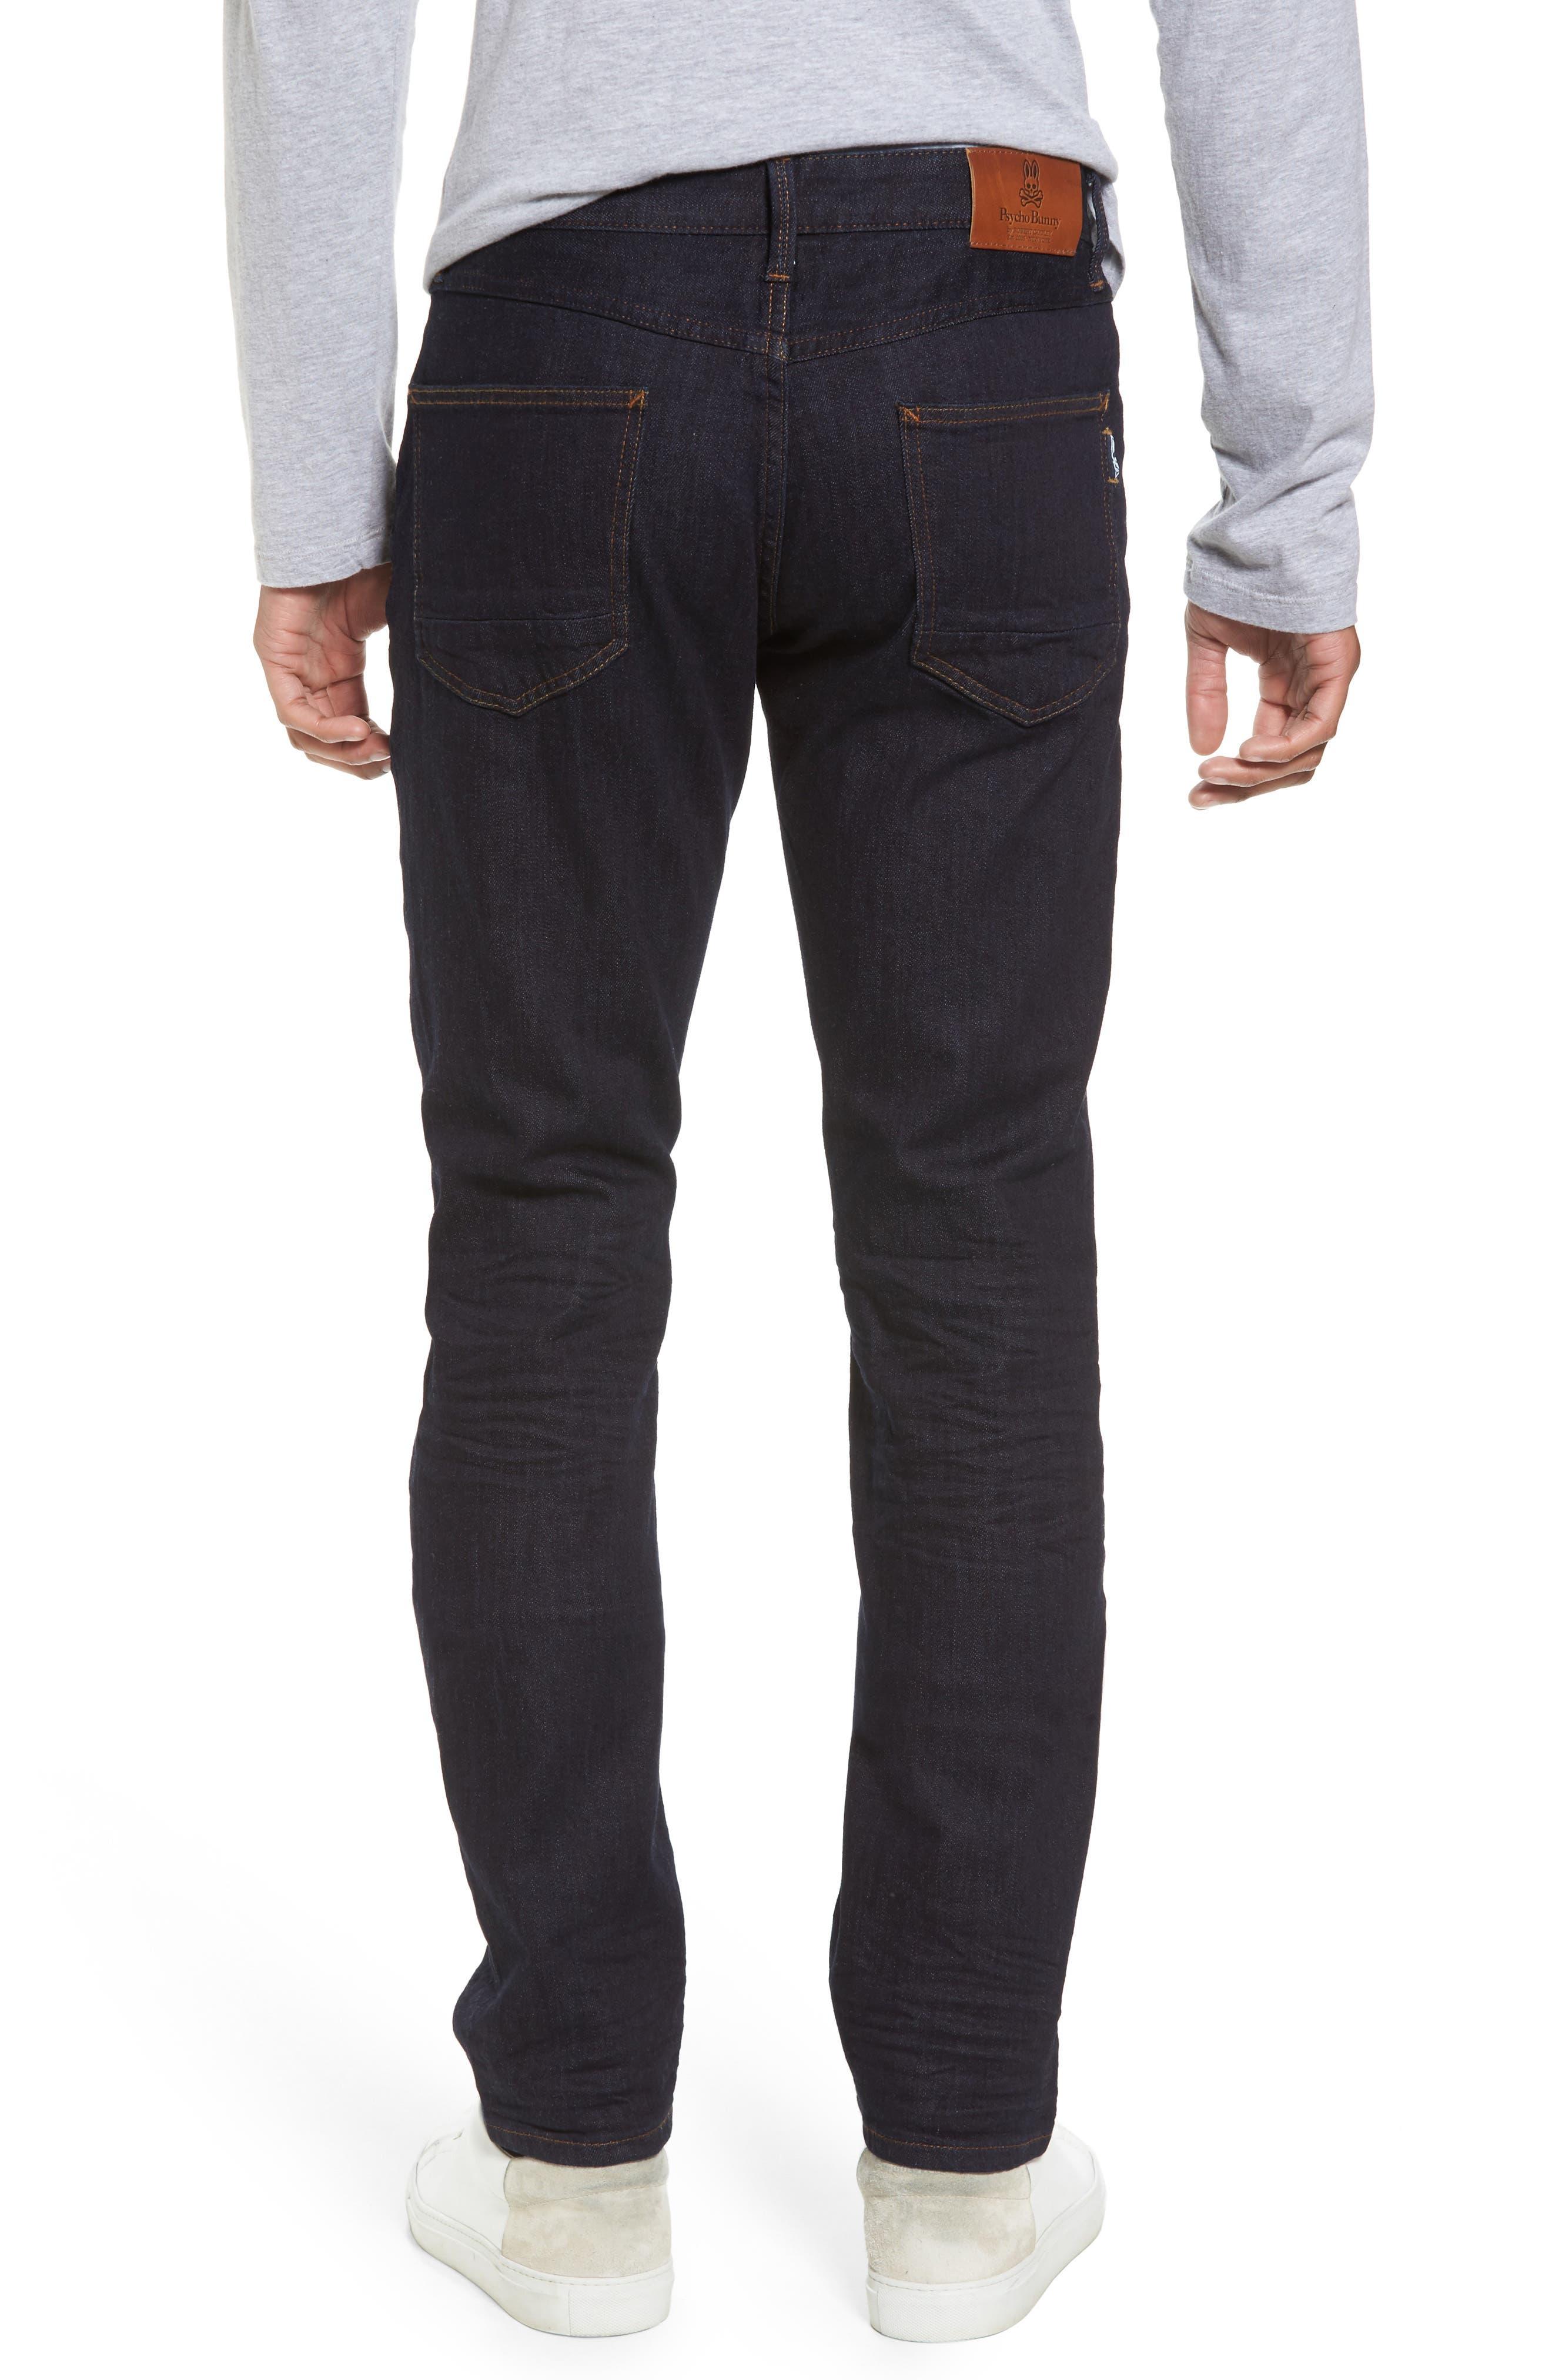 Canal Slim Fit Jeans,                             Alternate thumbnail 2, color,                             460